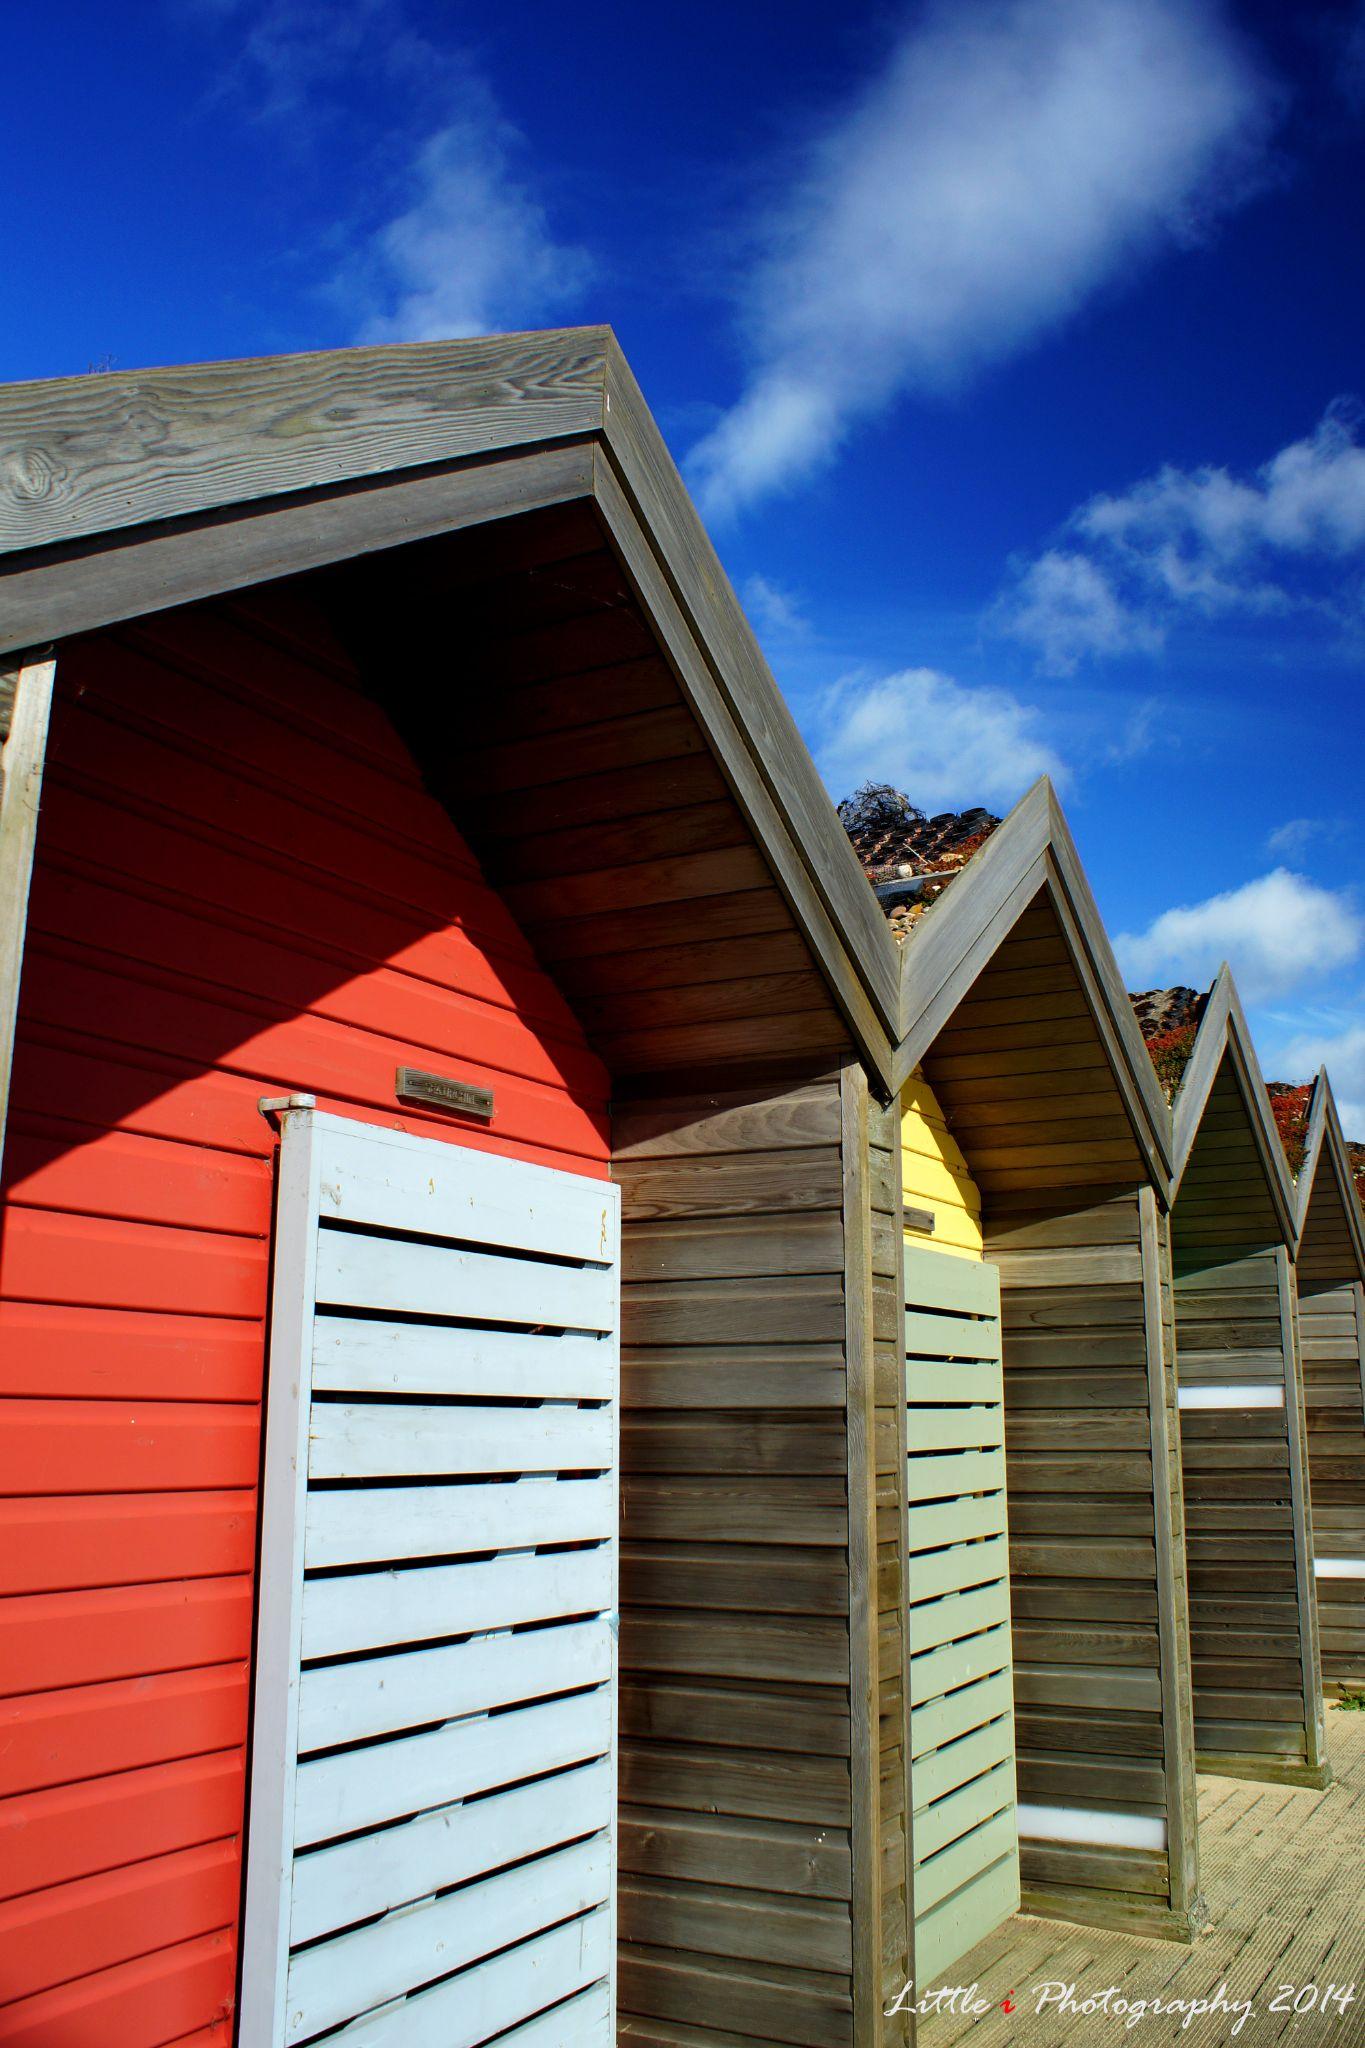 Blyth beach hut #1 by davecarter754